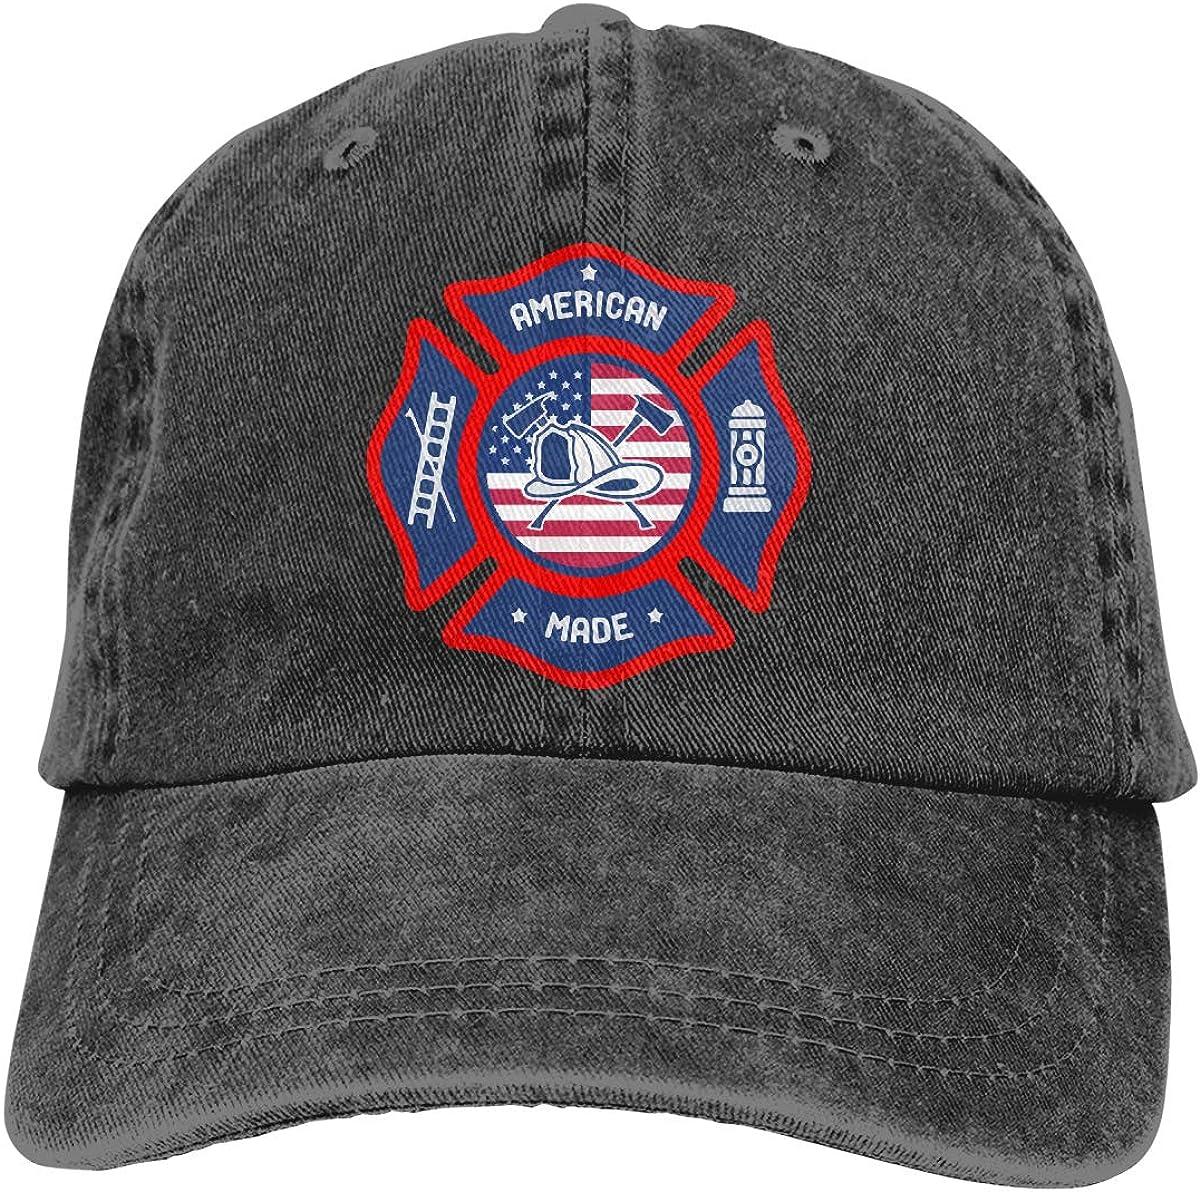 American Made Firefighter Adult Custom Cowboy Sun Hat Adjustable Baseball Cap